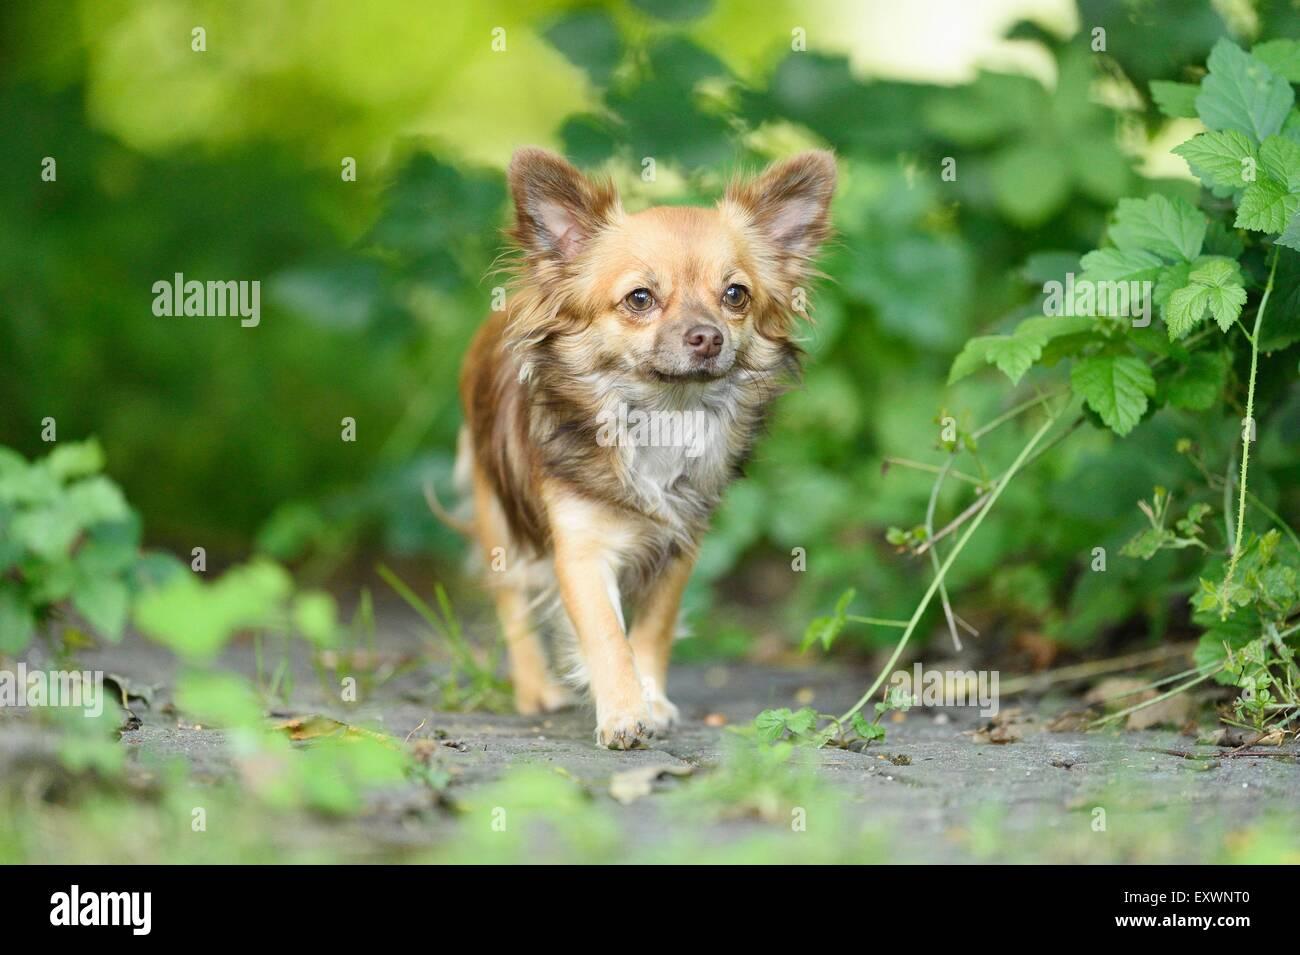 Chihuahua in garden, Upper Palatinate, Bavaria, Germany, Europe - Stock Image